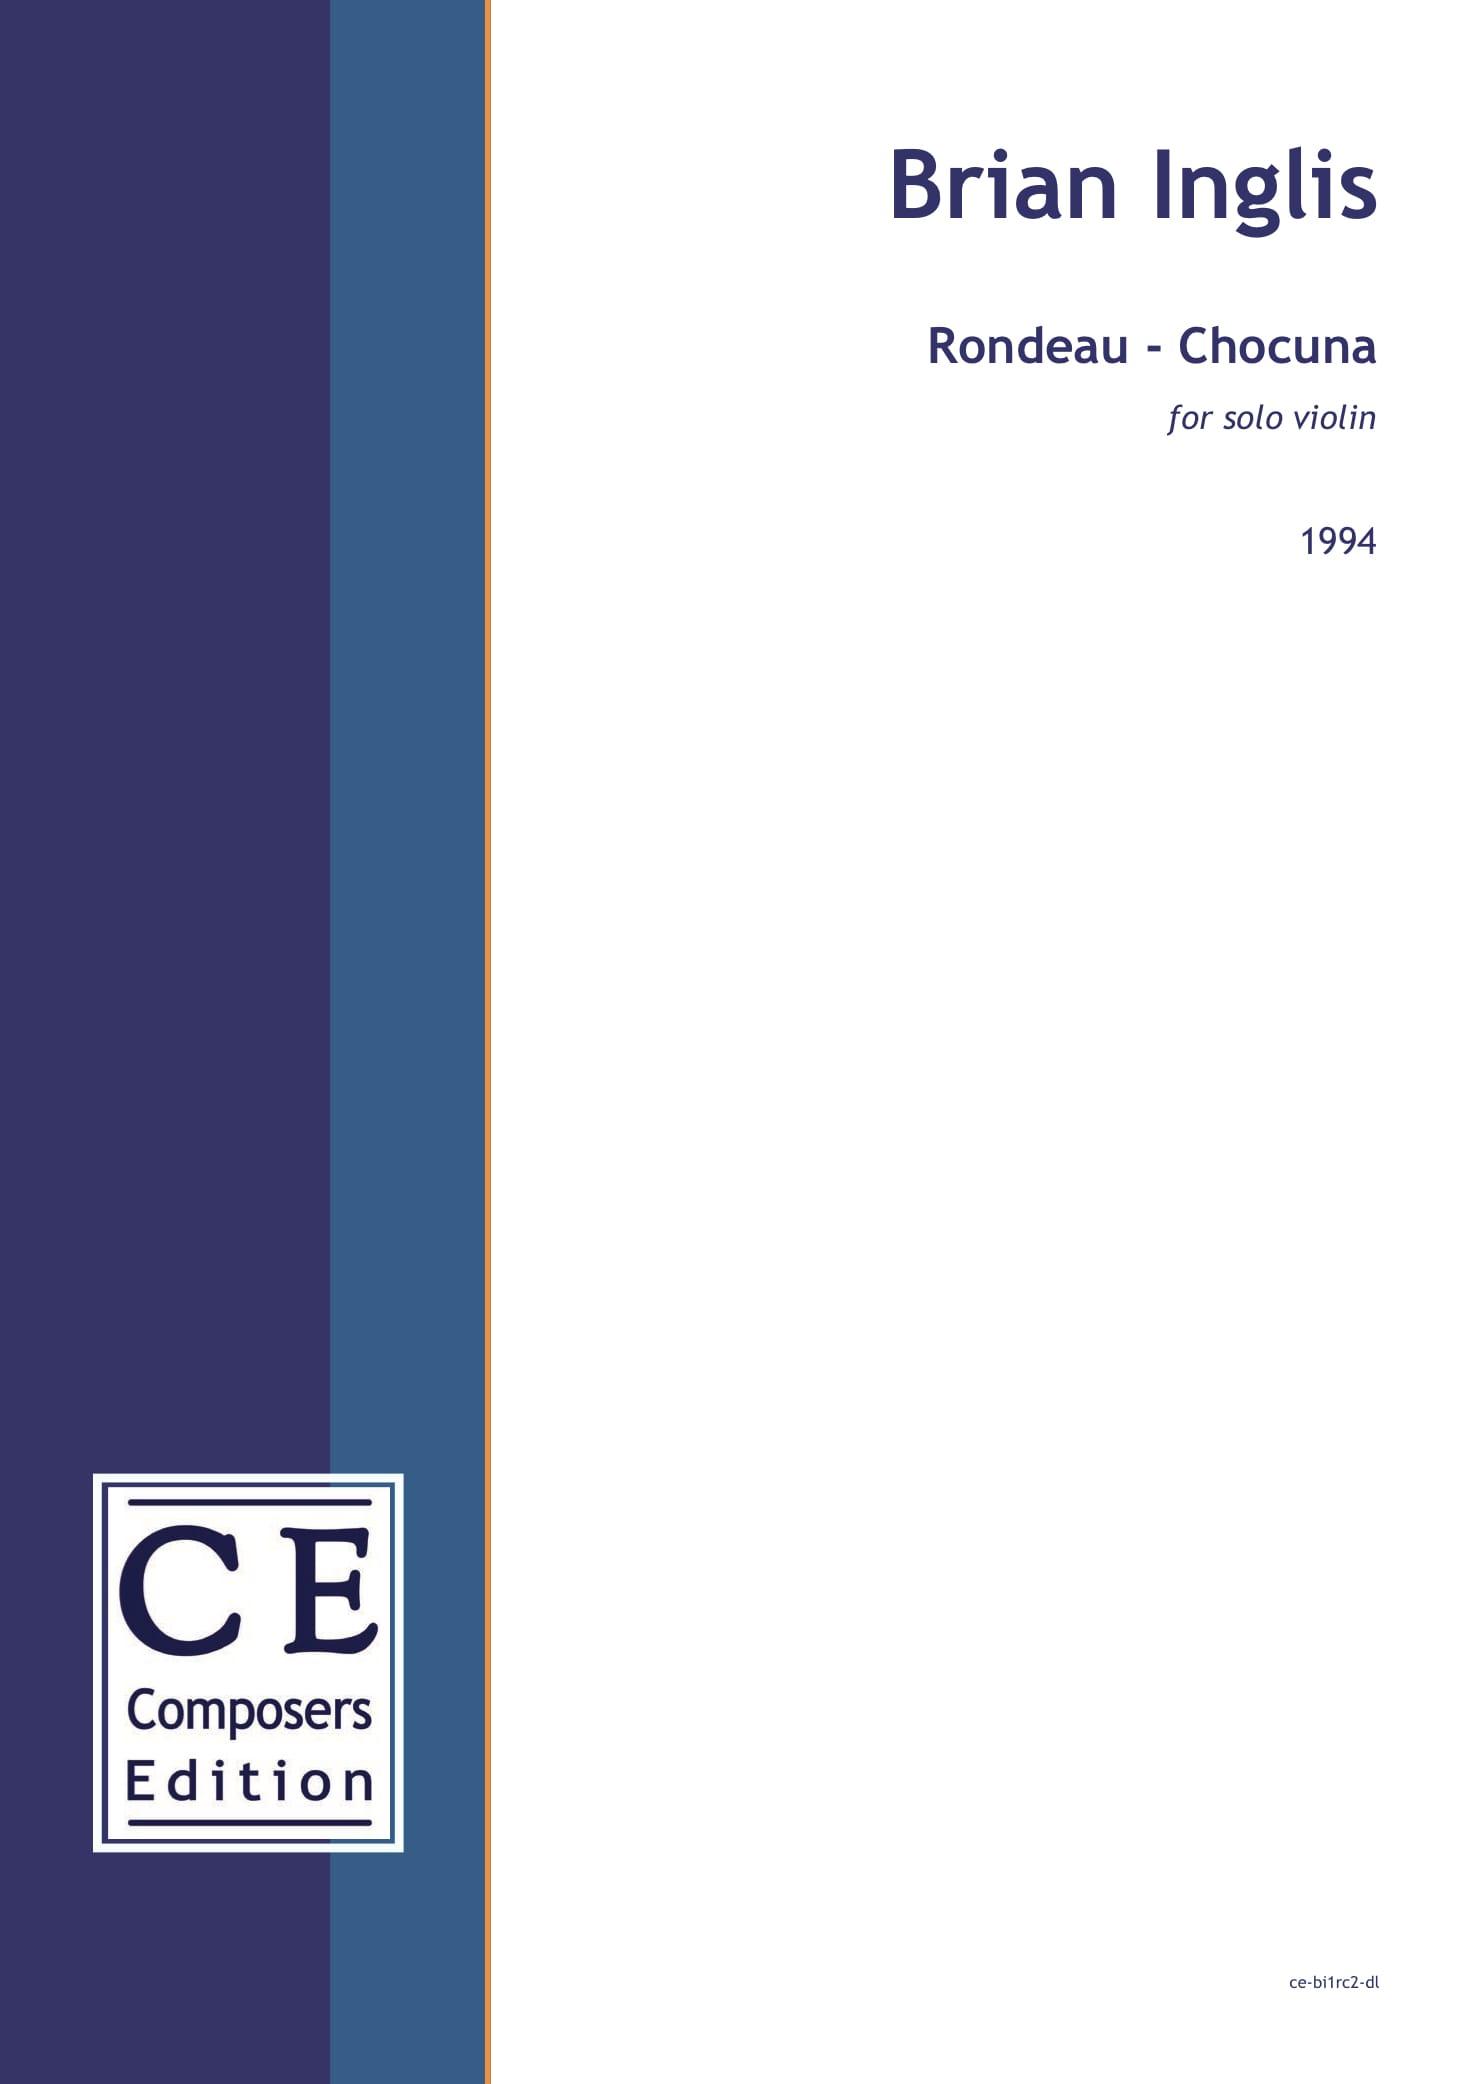 Brian Inglis: Rondeau - Chocuna for solo violin